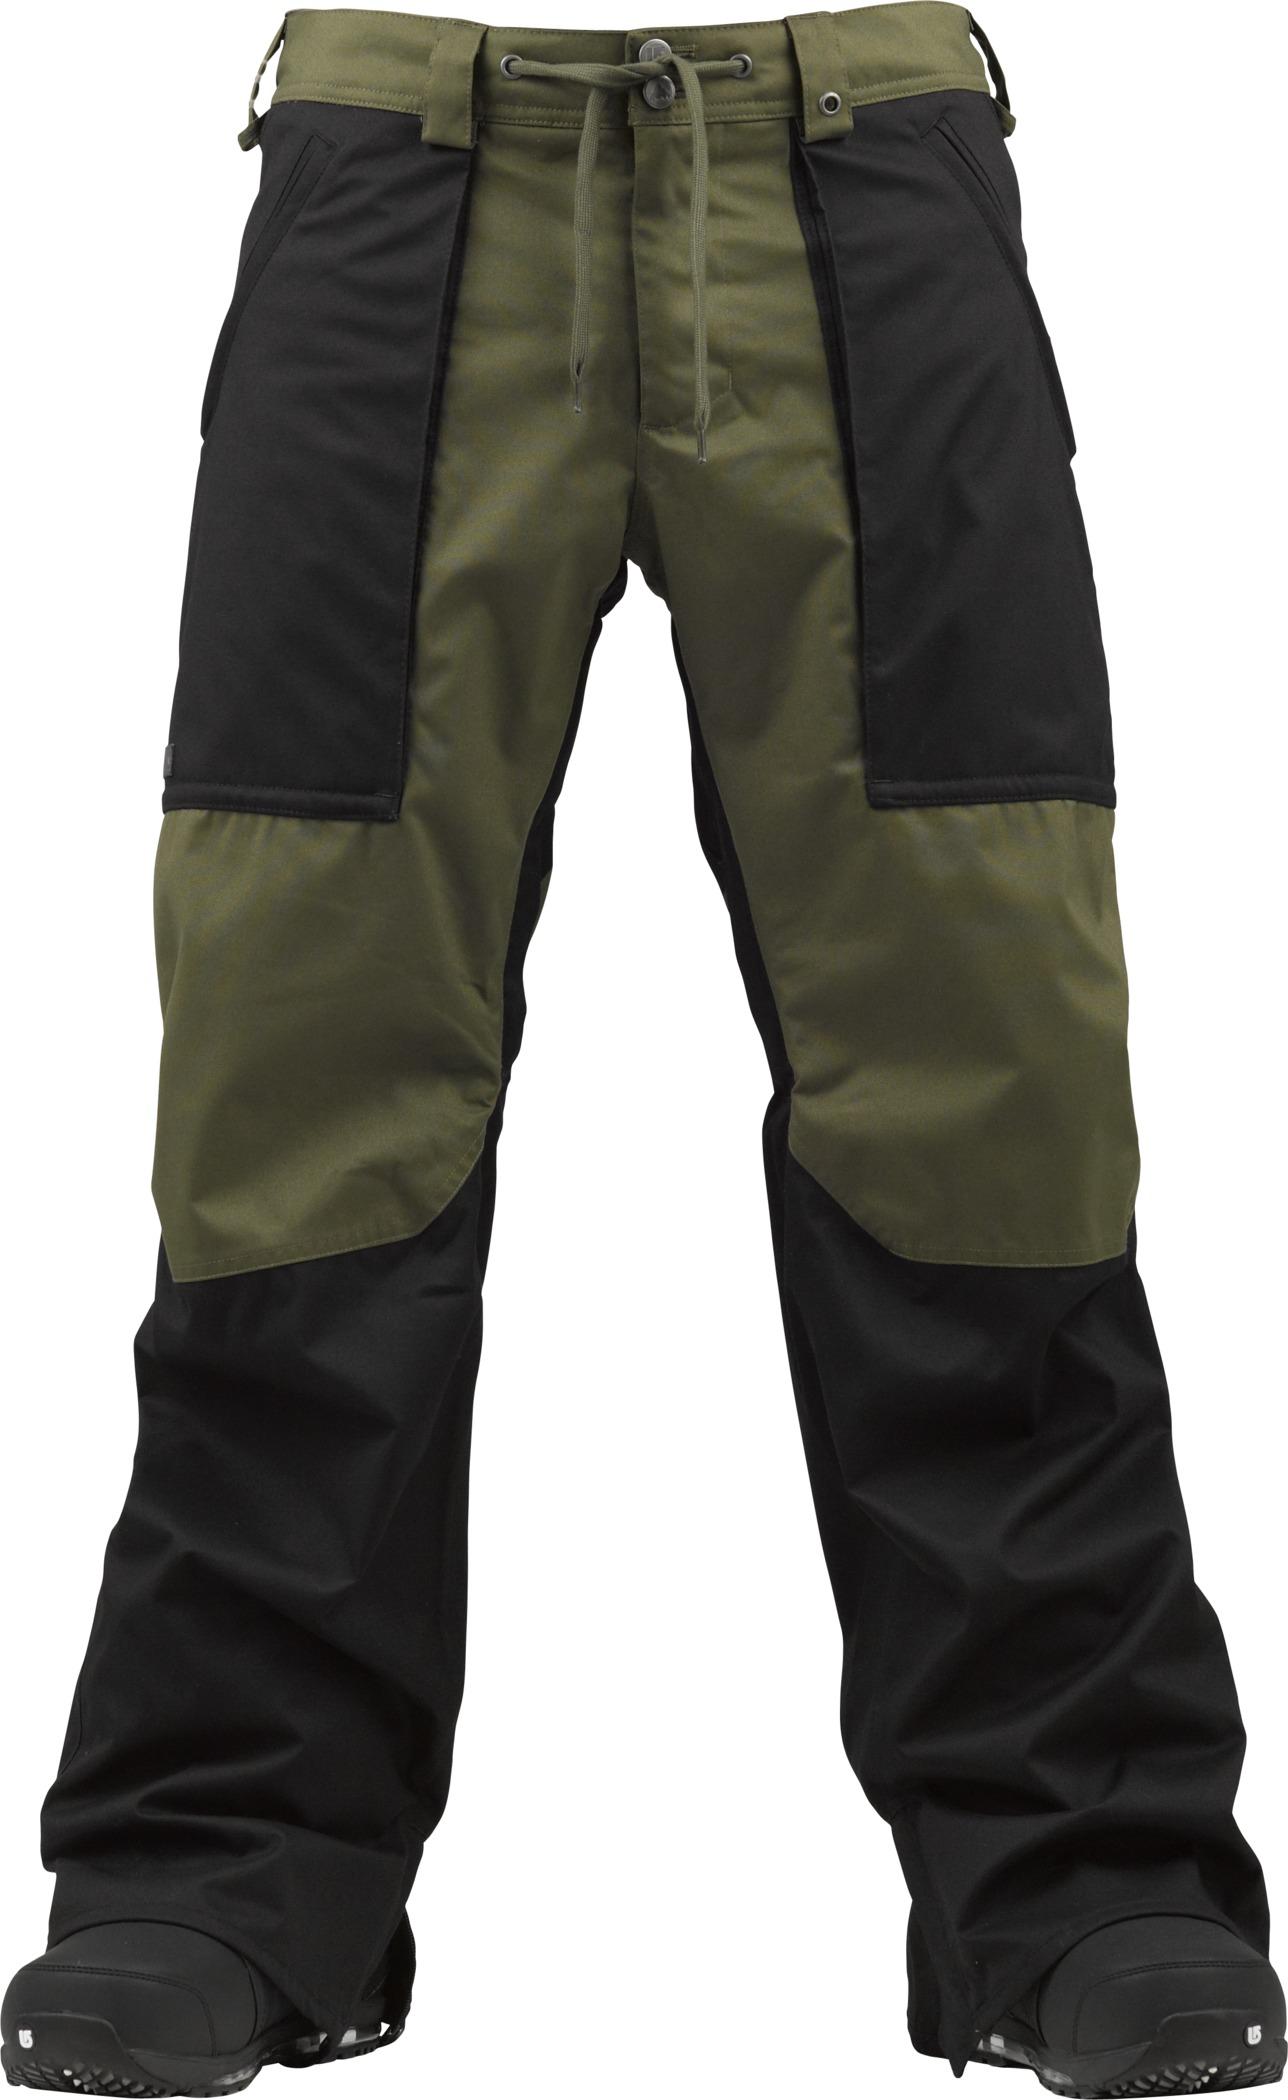 Spodnie Snowboardowe Burton Southside (True Black/Keef)